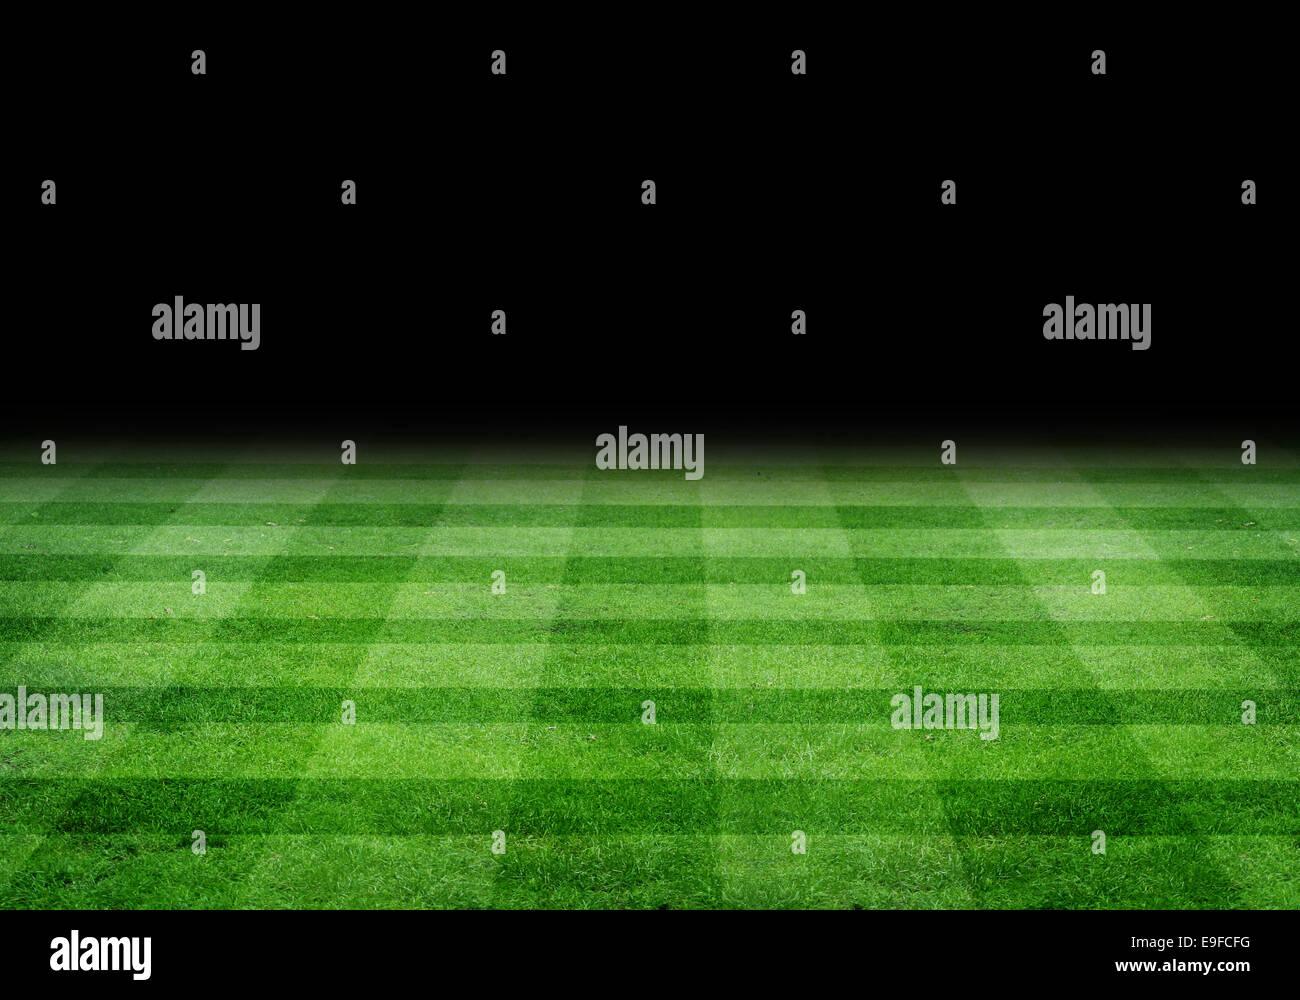 soccer background - Stock Image